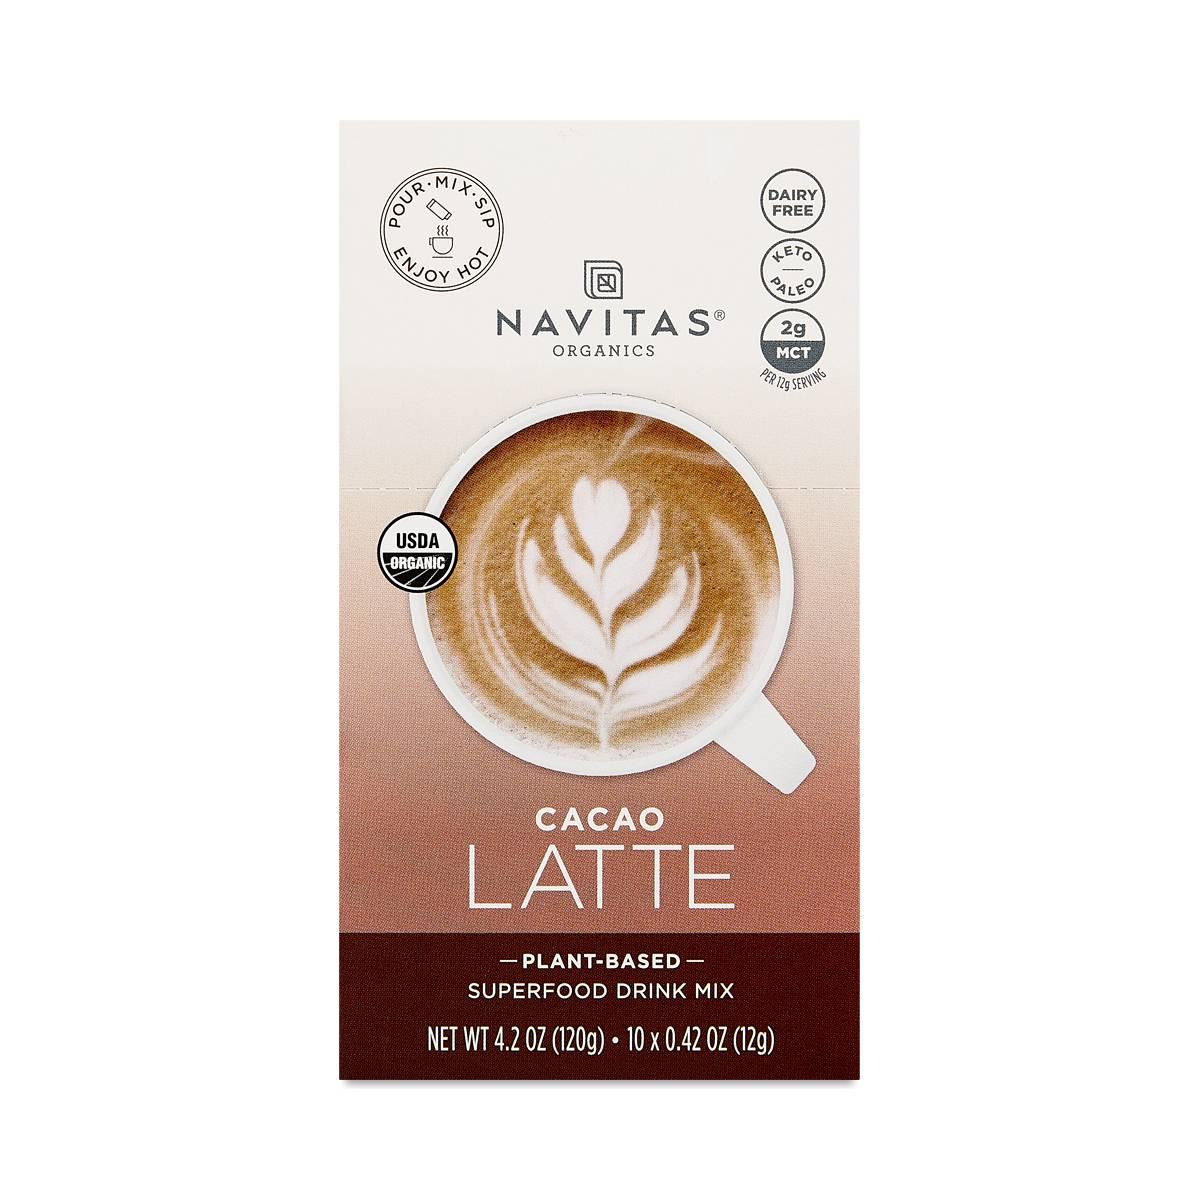 Navitas Organics Latte, Cacao